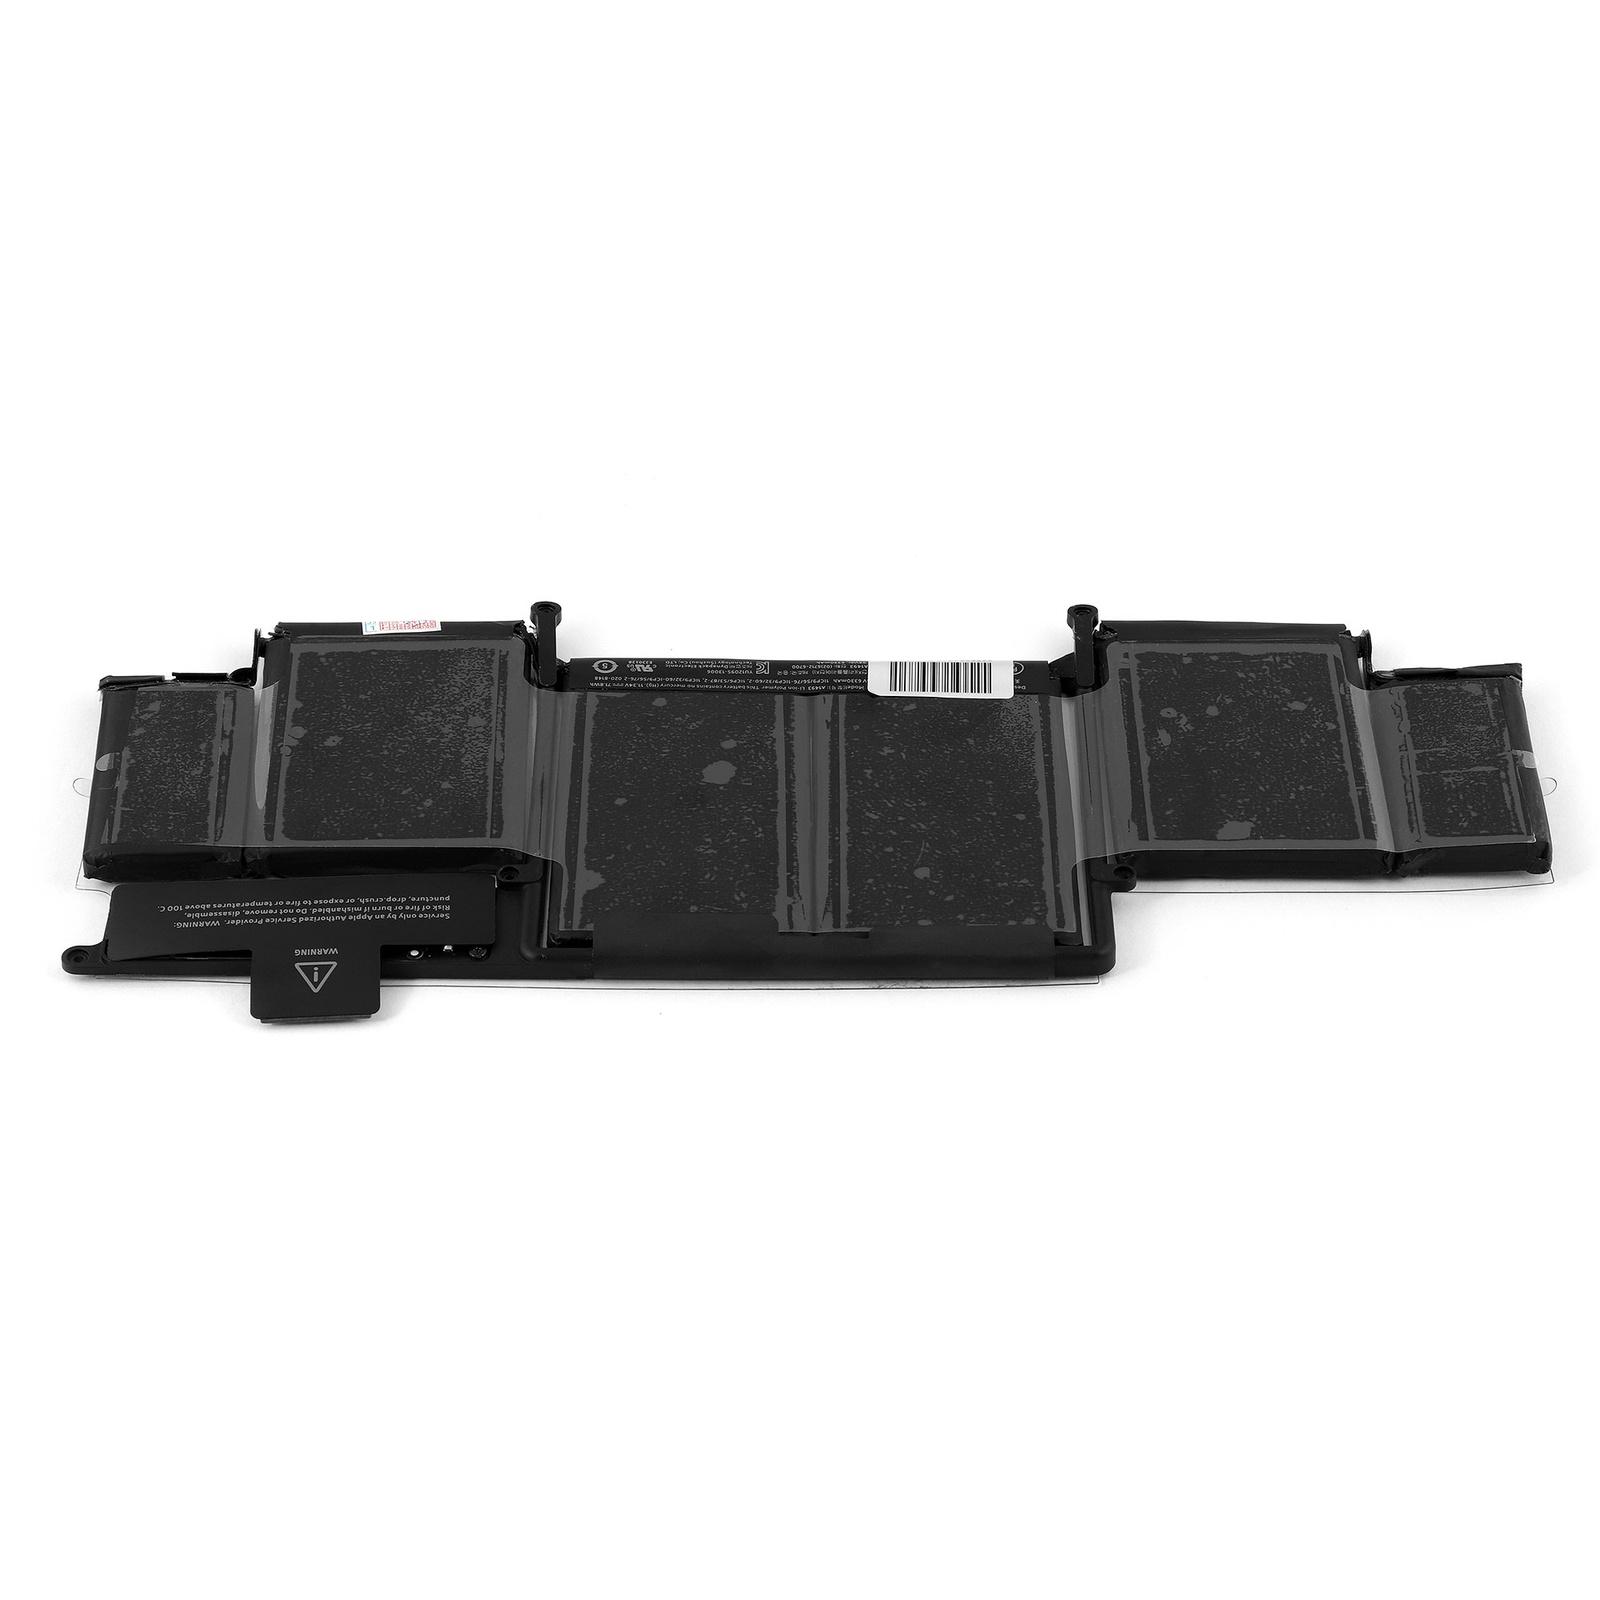 цены на Аккумулятор для ноутбука OEM Apple (A1493 ) MacBook Pro 13